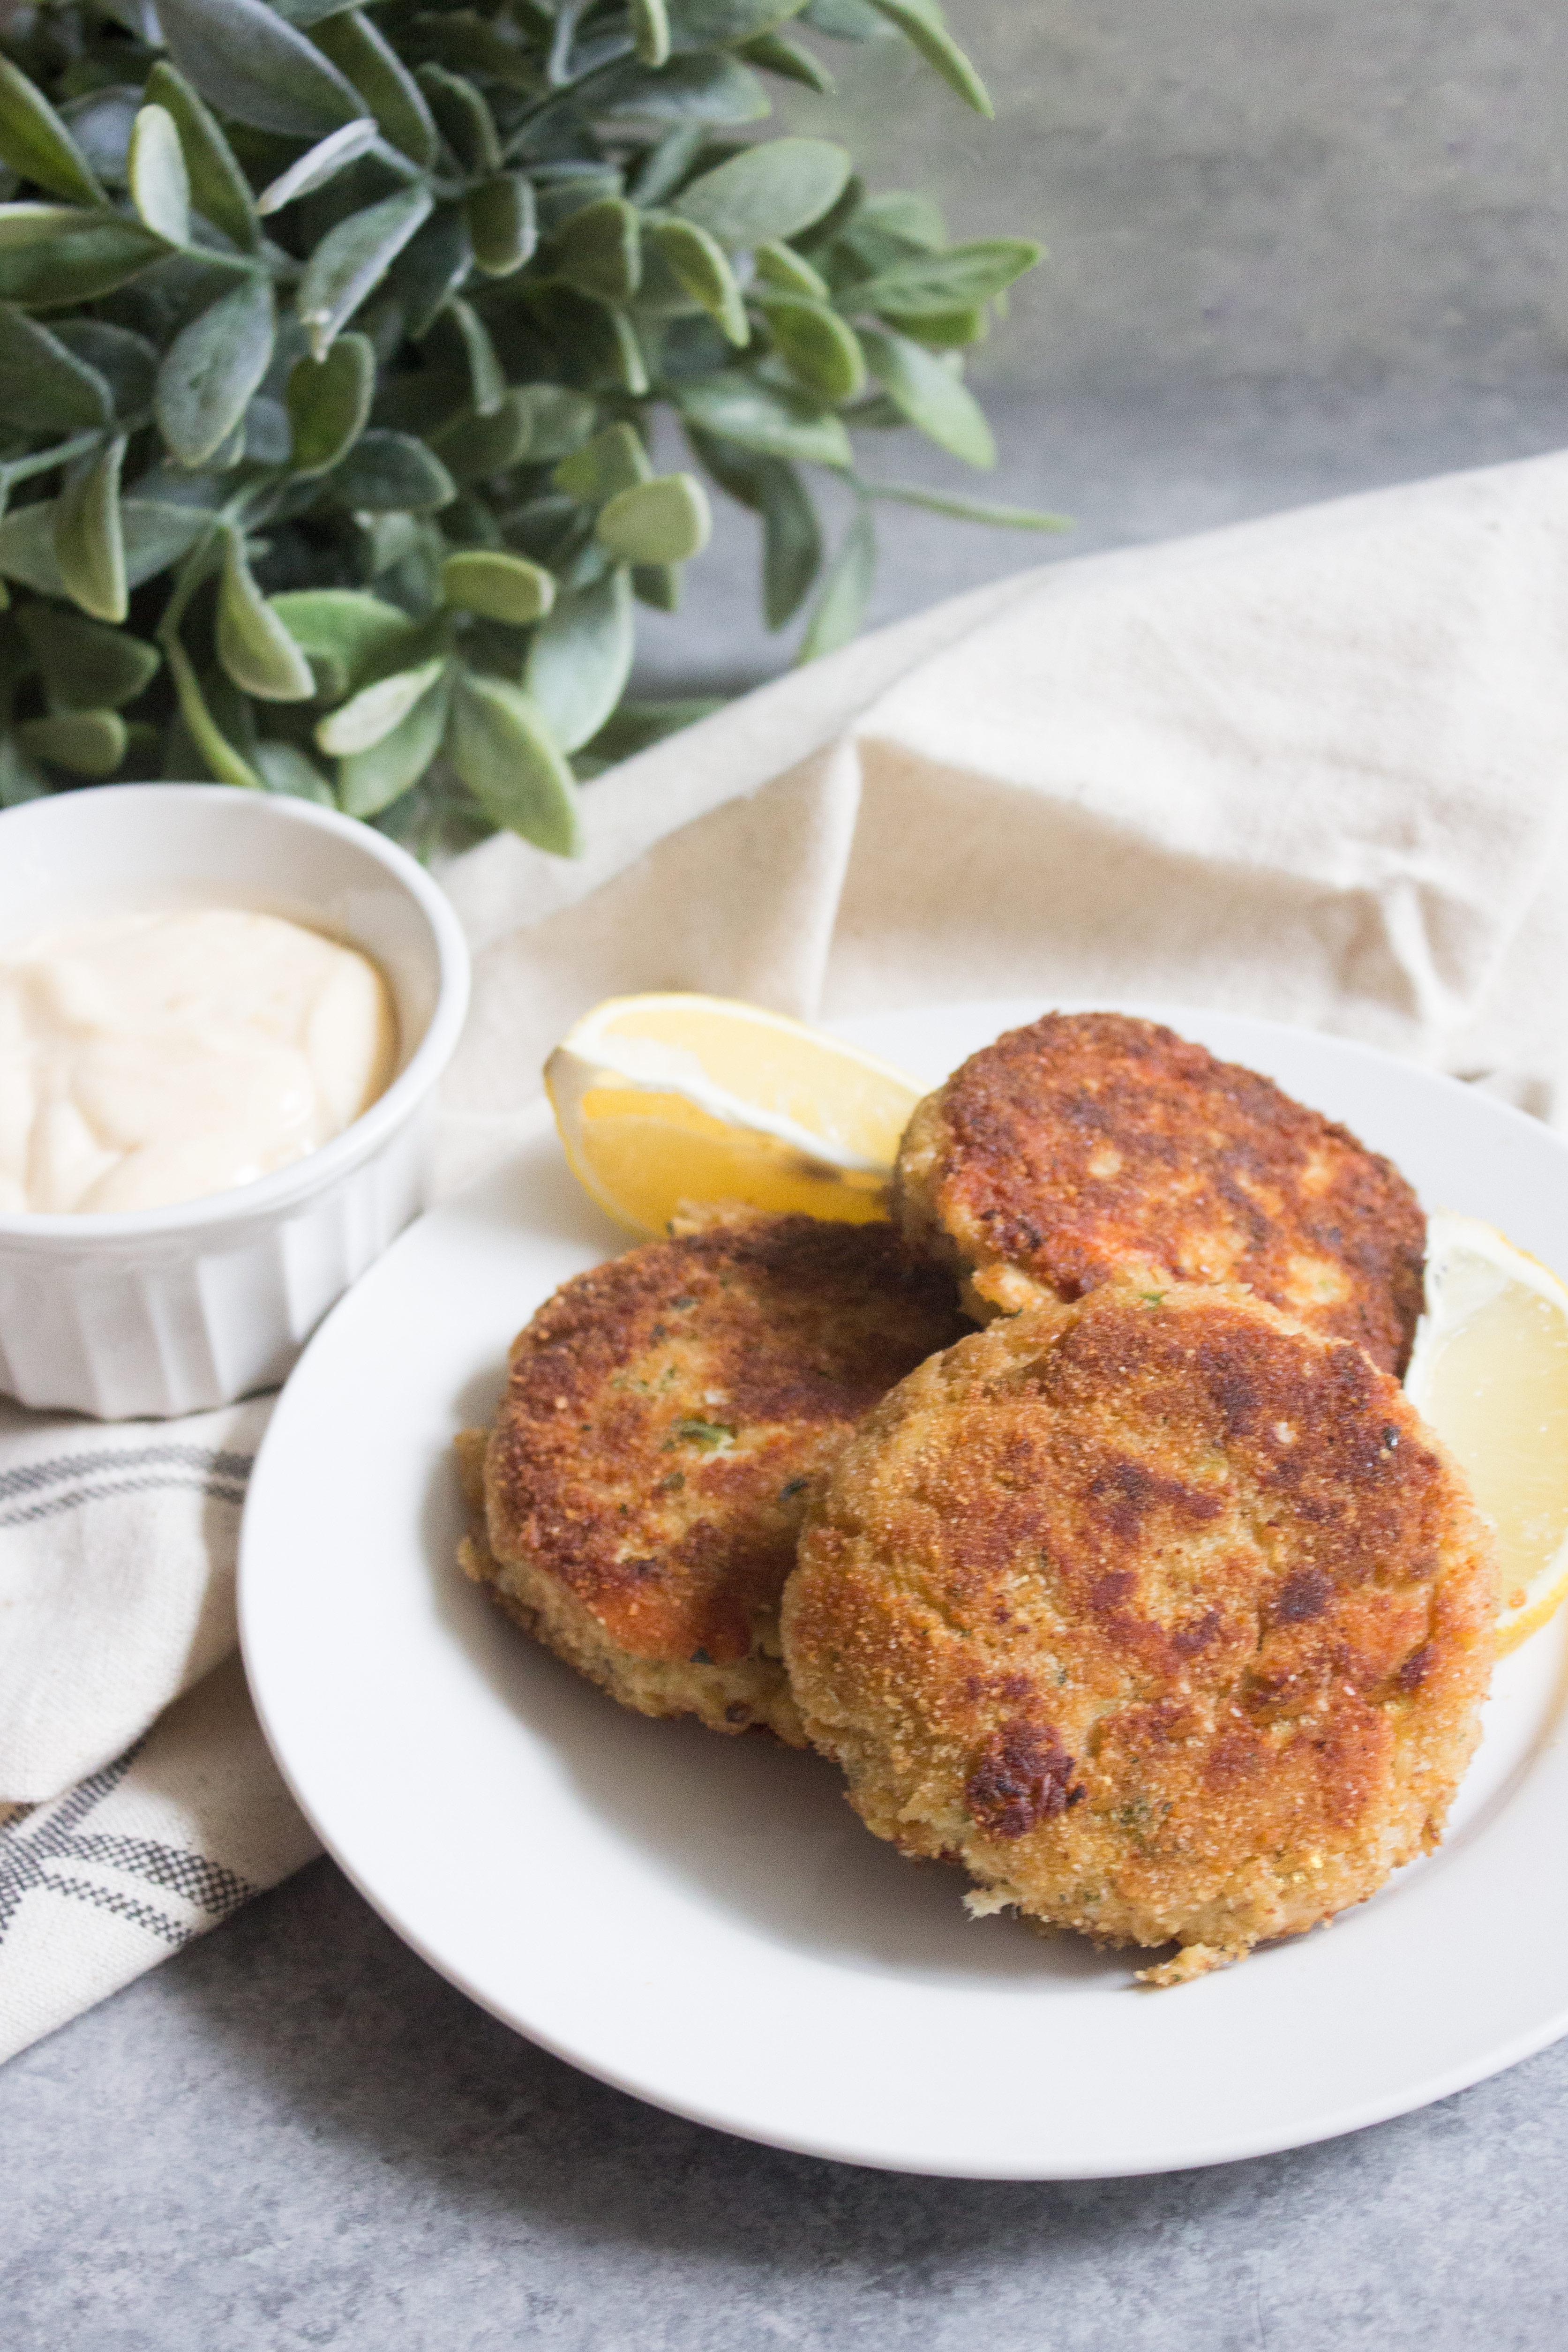 Easy Tuna Cakes With Lemon Garlic Aioli